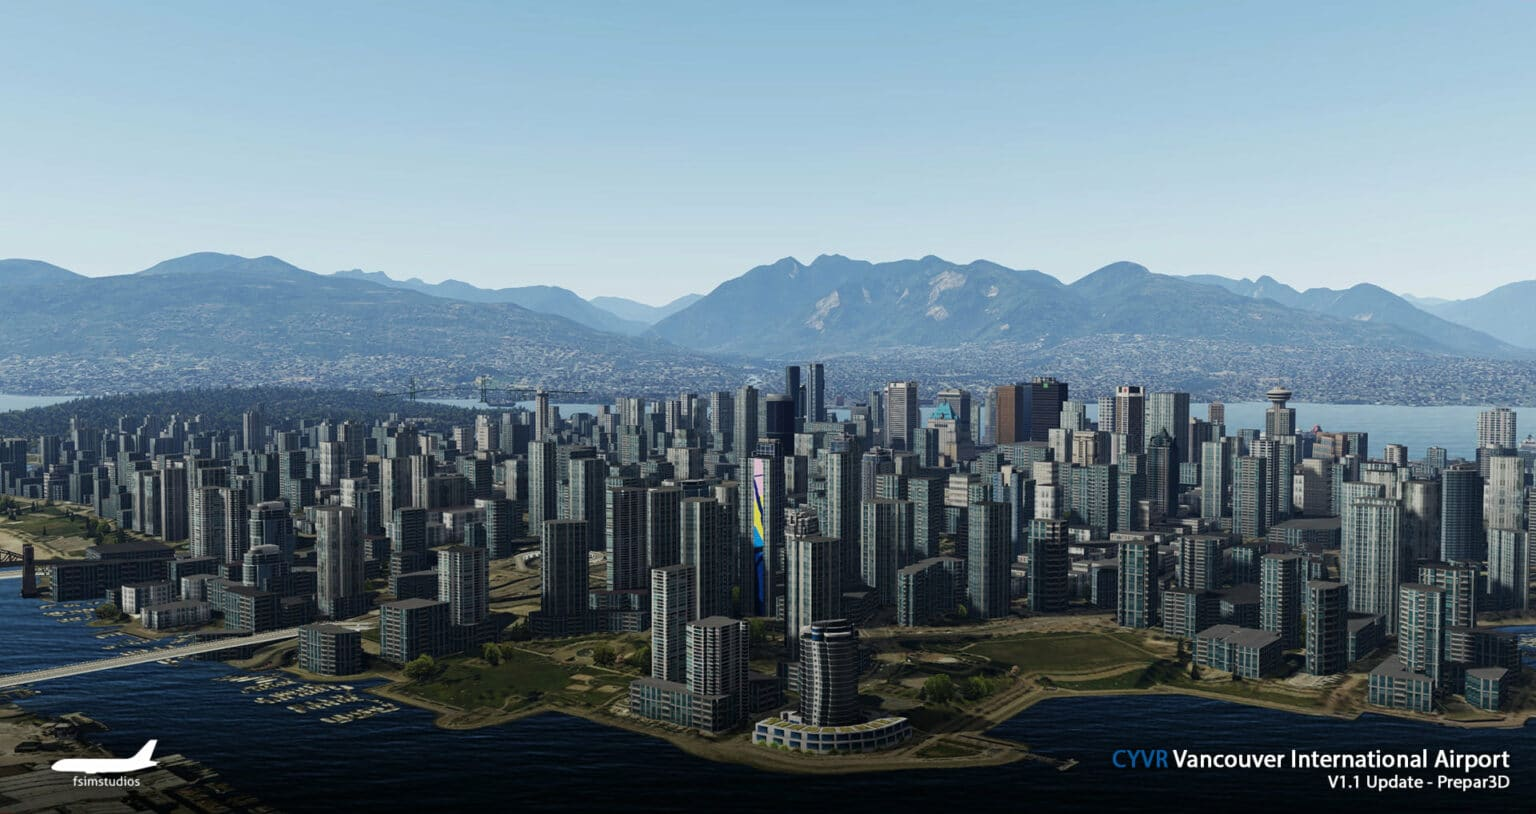 FSimstudio_Vancouver (6)